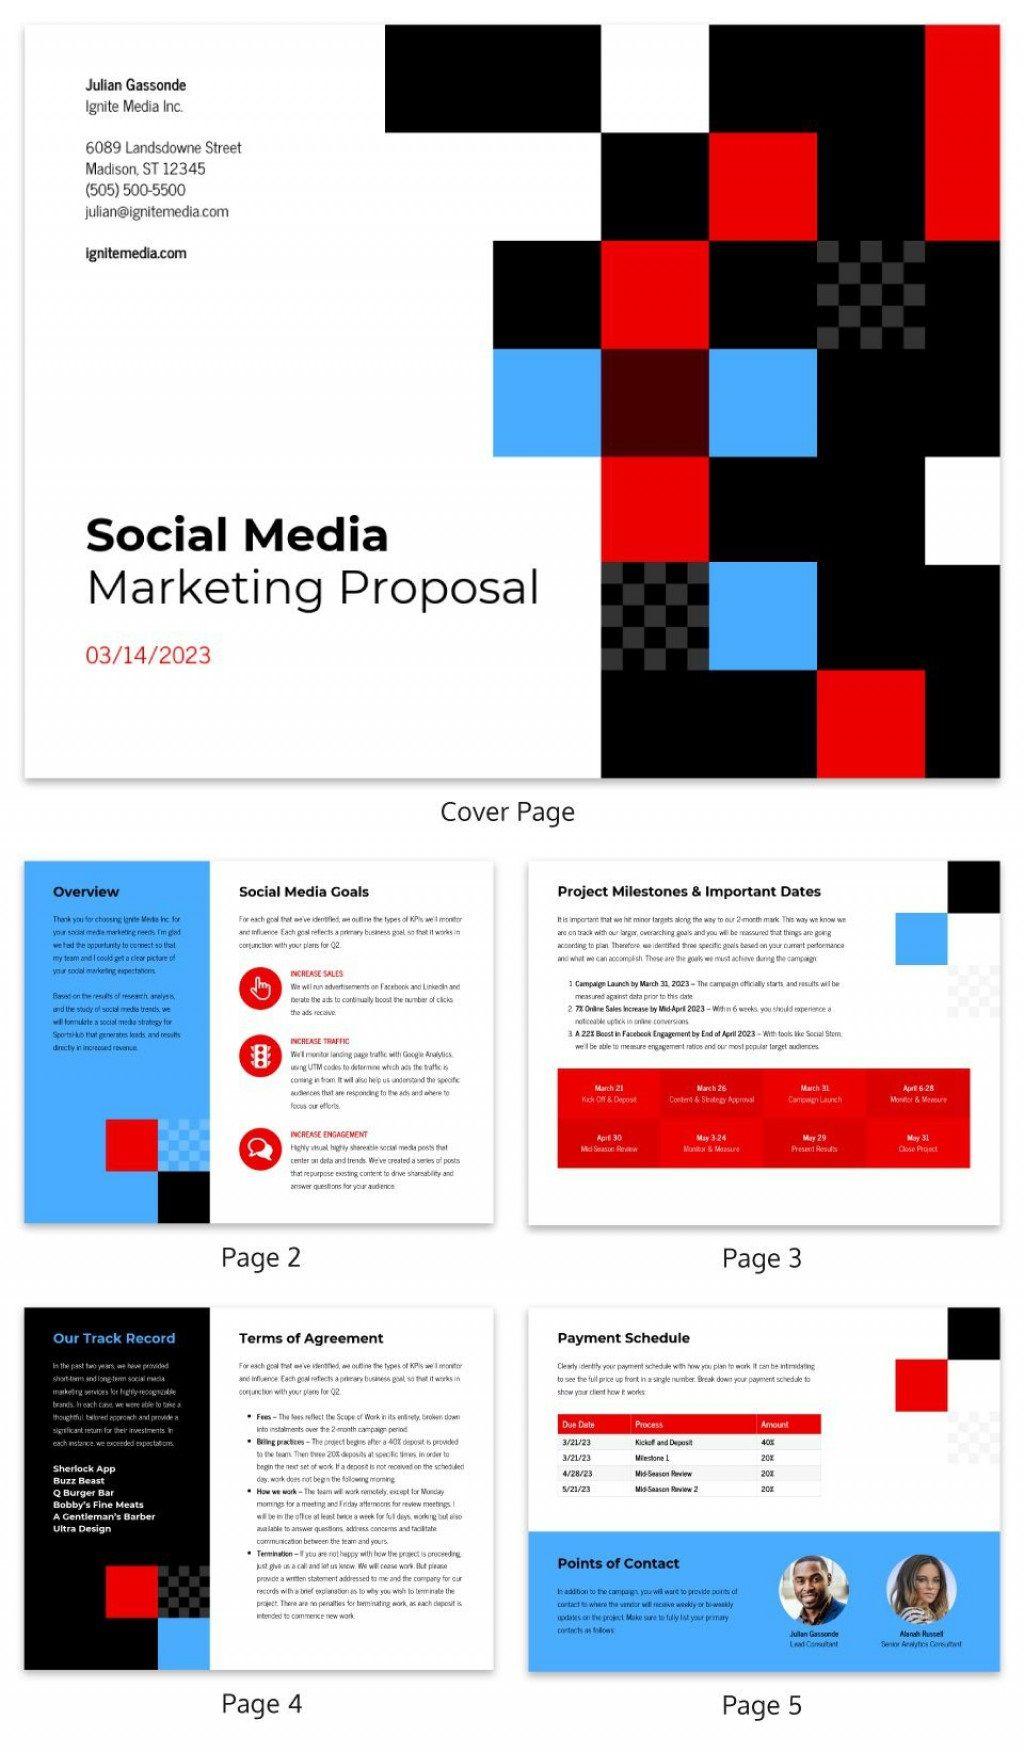 004 Fascinating Social Media Proposal Template Ppt High Def Full